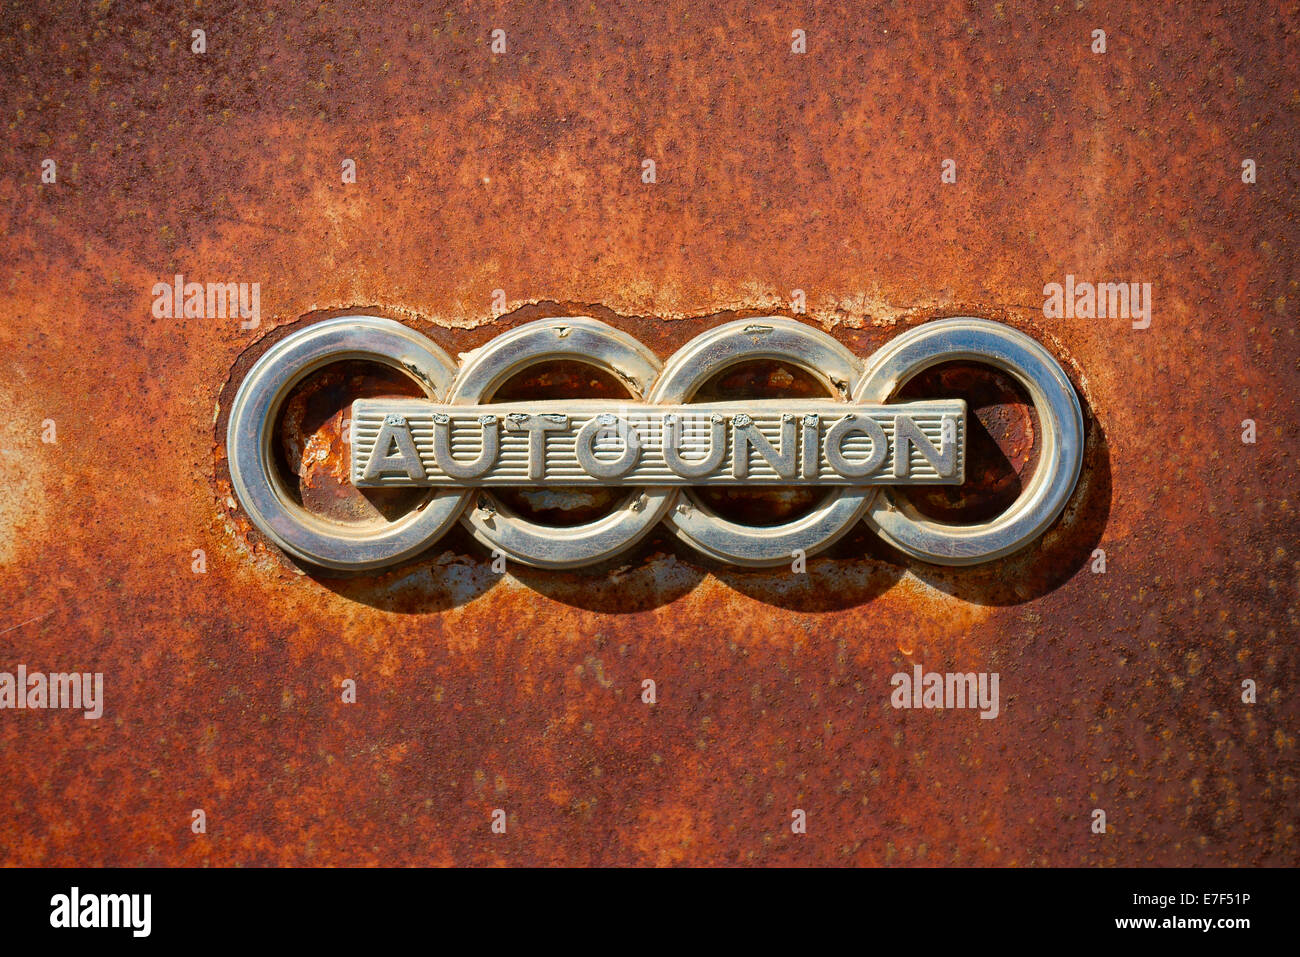 Lettering Auto Union Old Logo Of The Auto Union Car Company In A